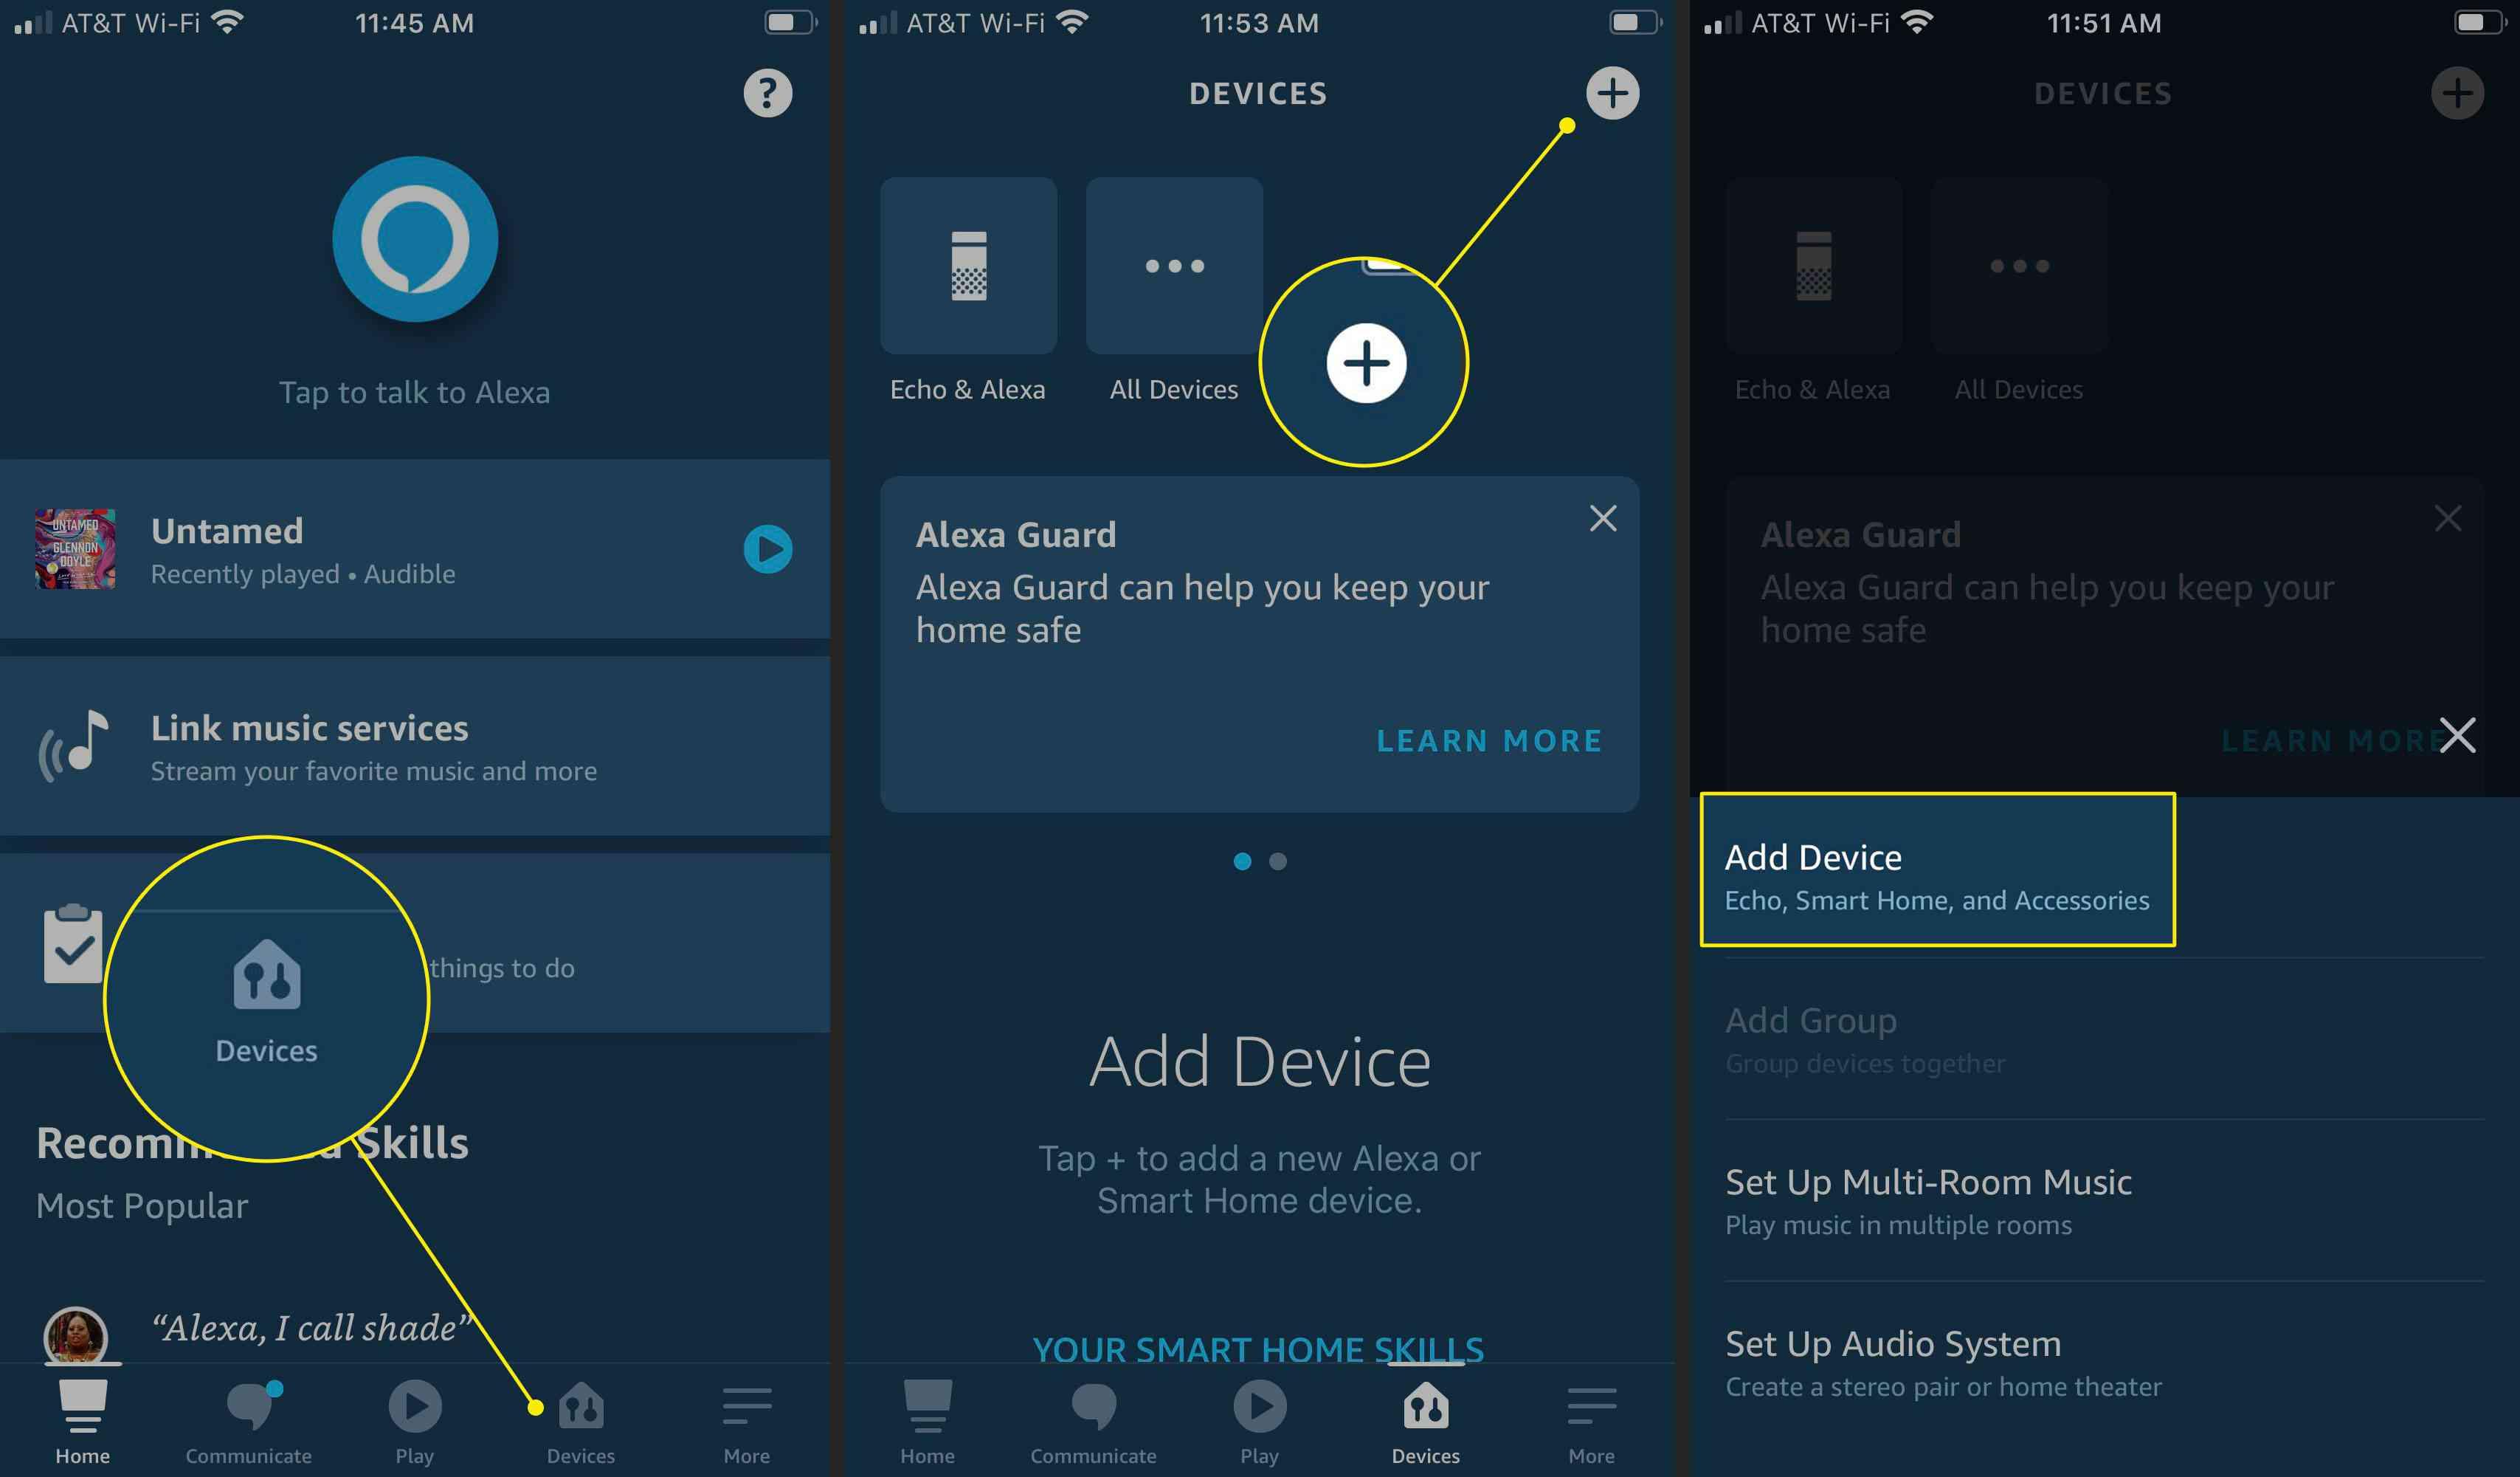 Adding a device to the Alexa app